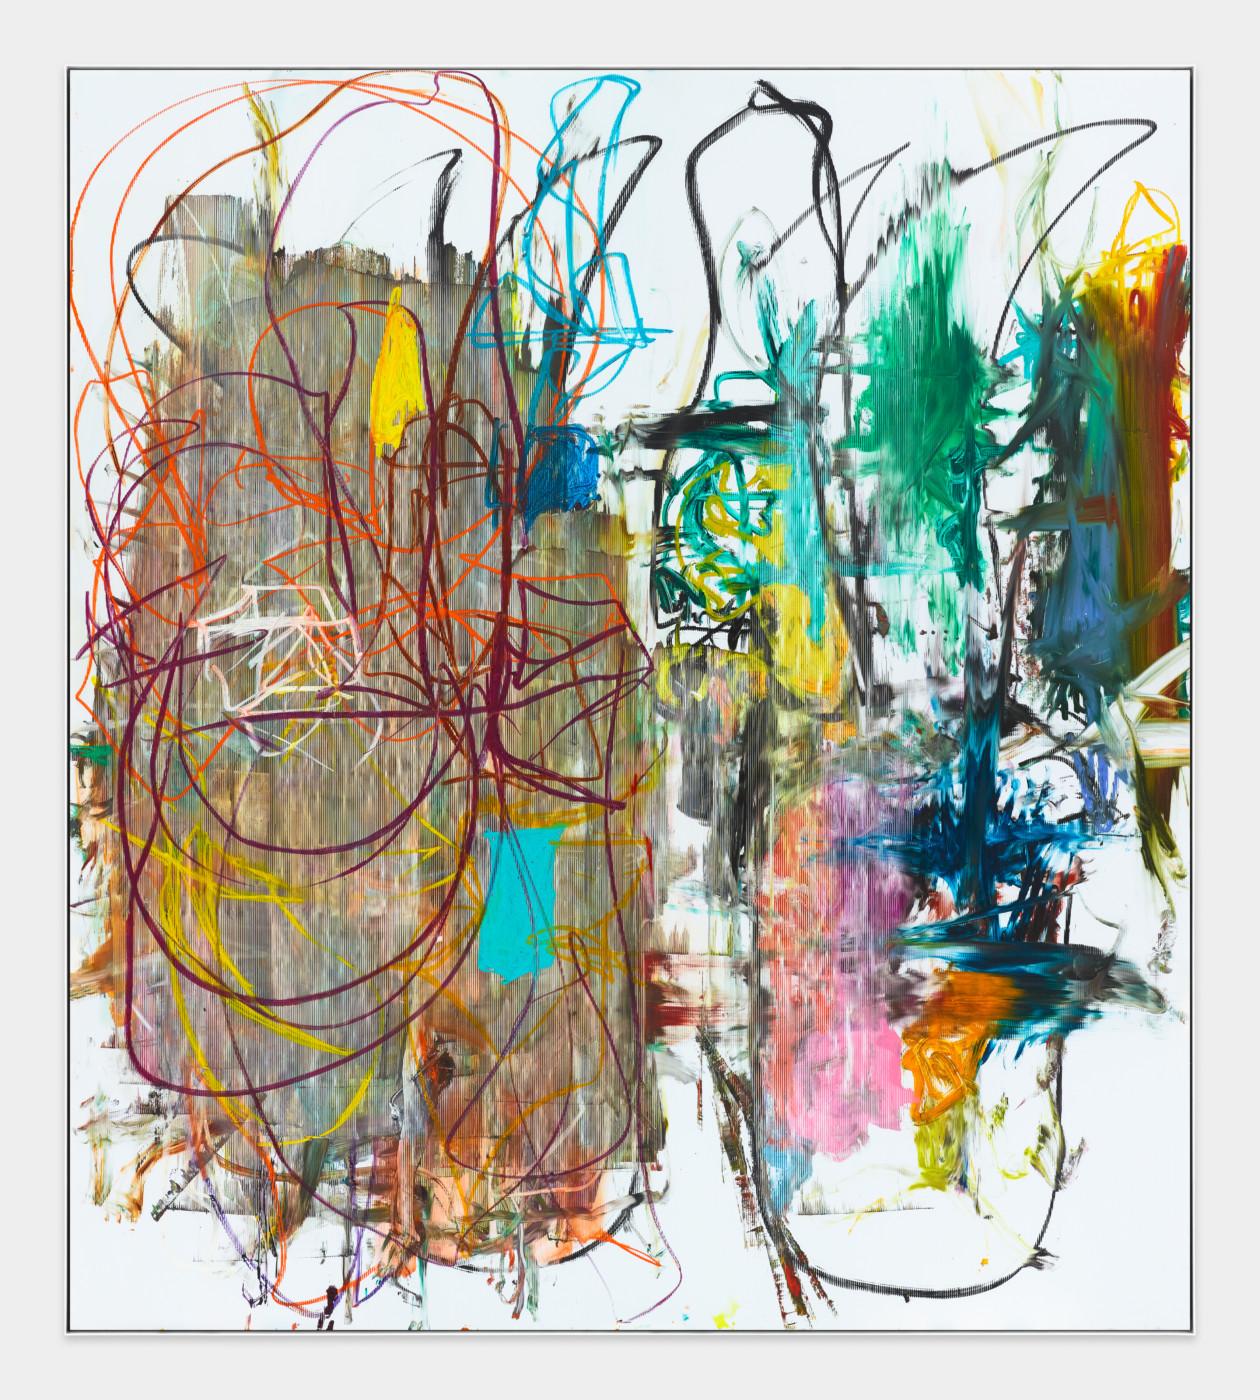 AARON GARBER-MAIKOVSKA  Untitled , 2018  Oil on fluted polyboard in artist frame  228,6 x 203,2 cm / 90 x 80 in  Aaron Garber-Maikovska